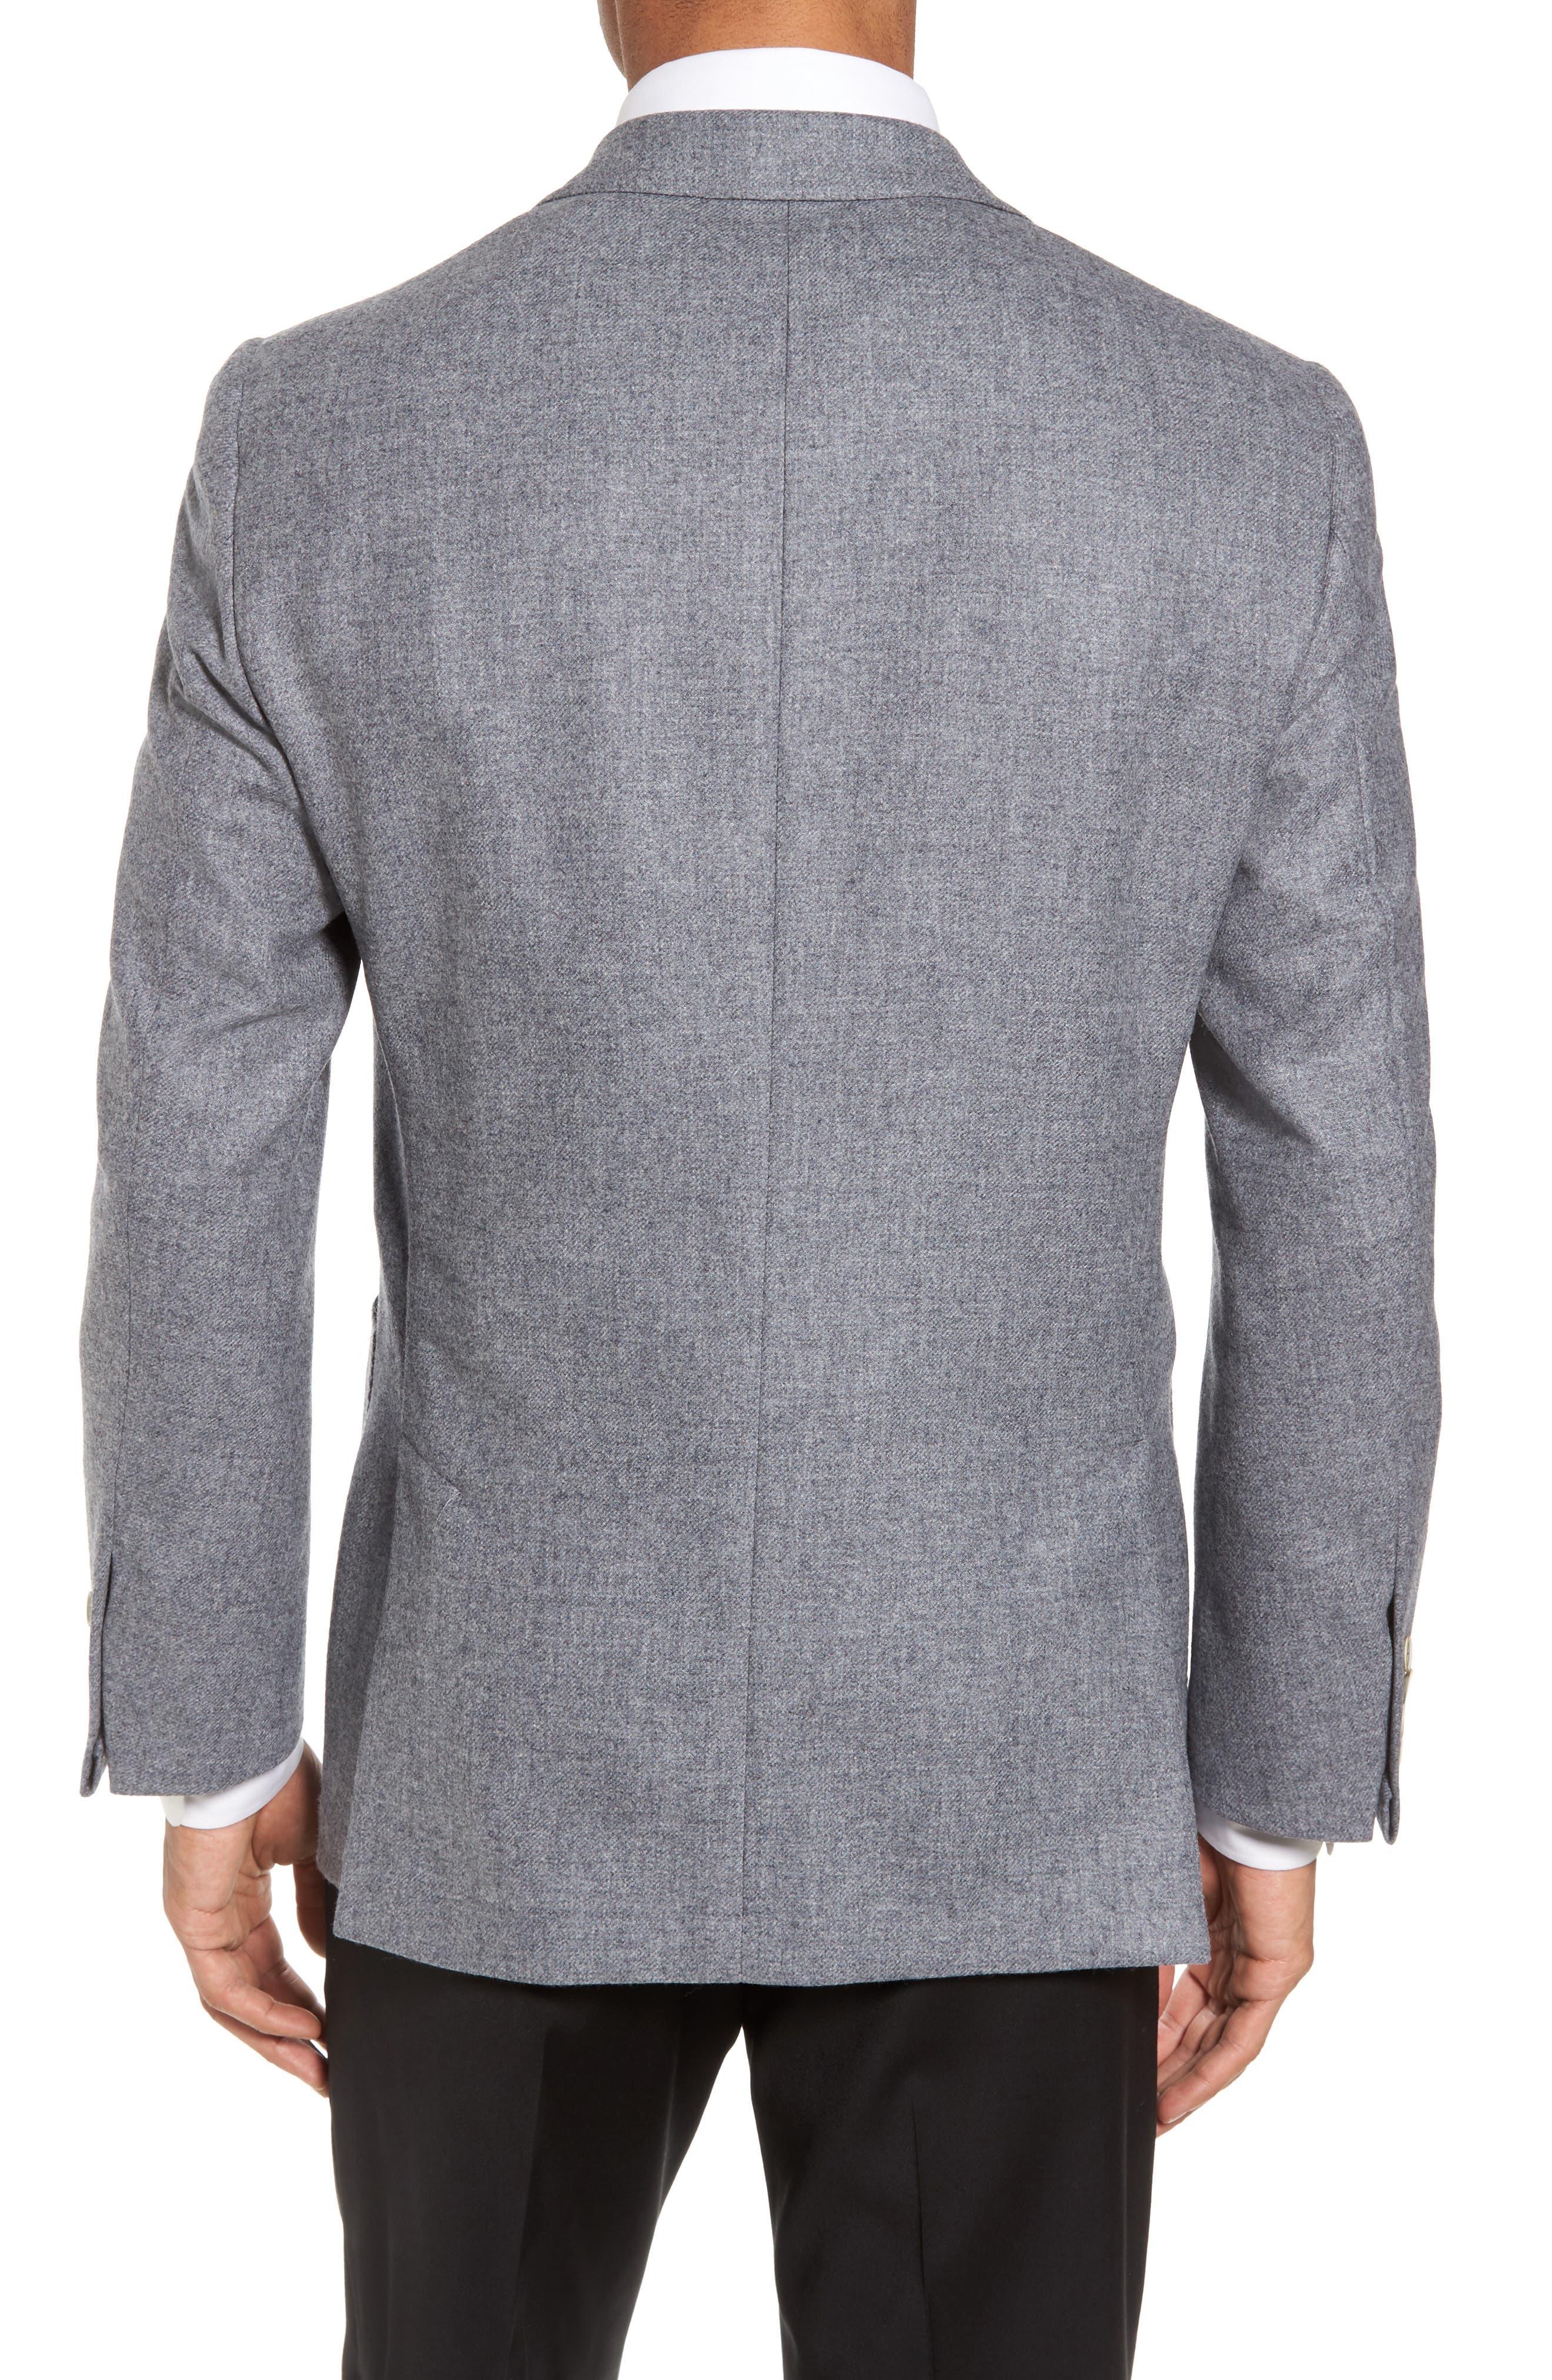 Alternate Image 2  - Hickey Freeman Classic B Fit Wool & Cashmere Blazer